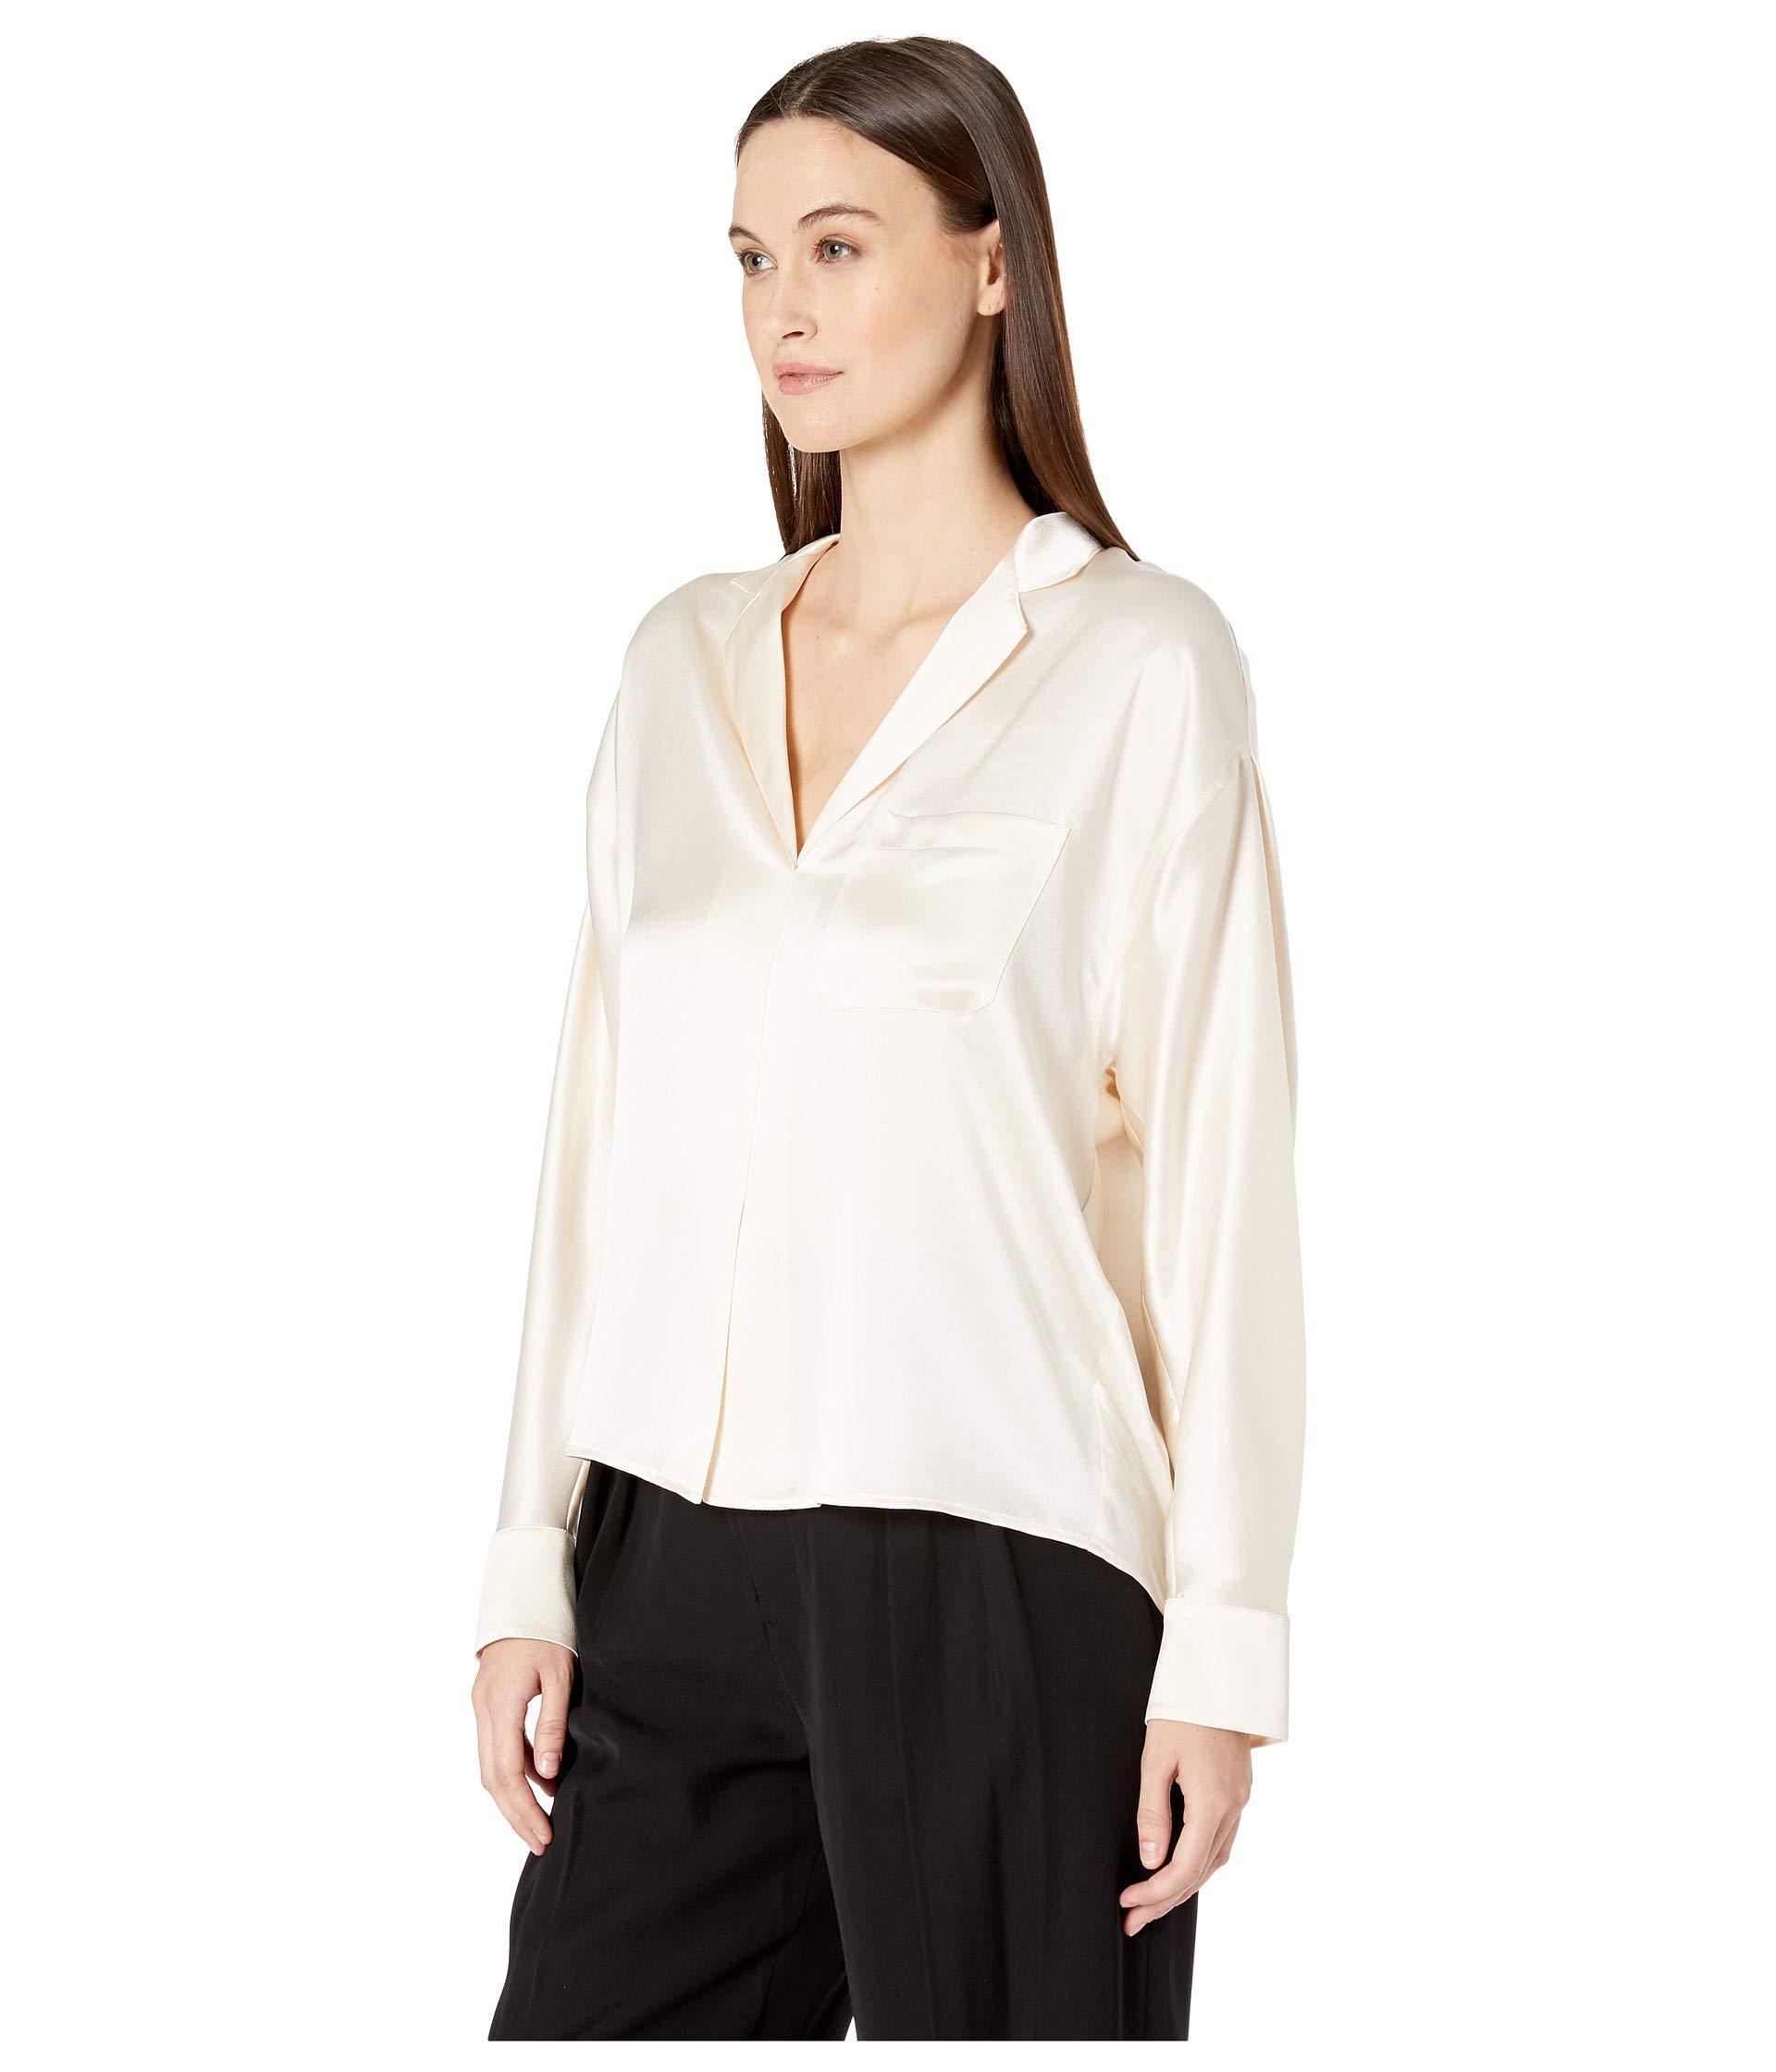 ccf79834aea4d Lyst - Vince Pajama Popover (chiffon) Women s Blouse in White